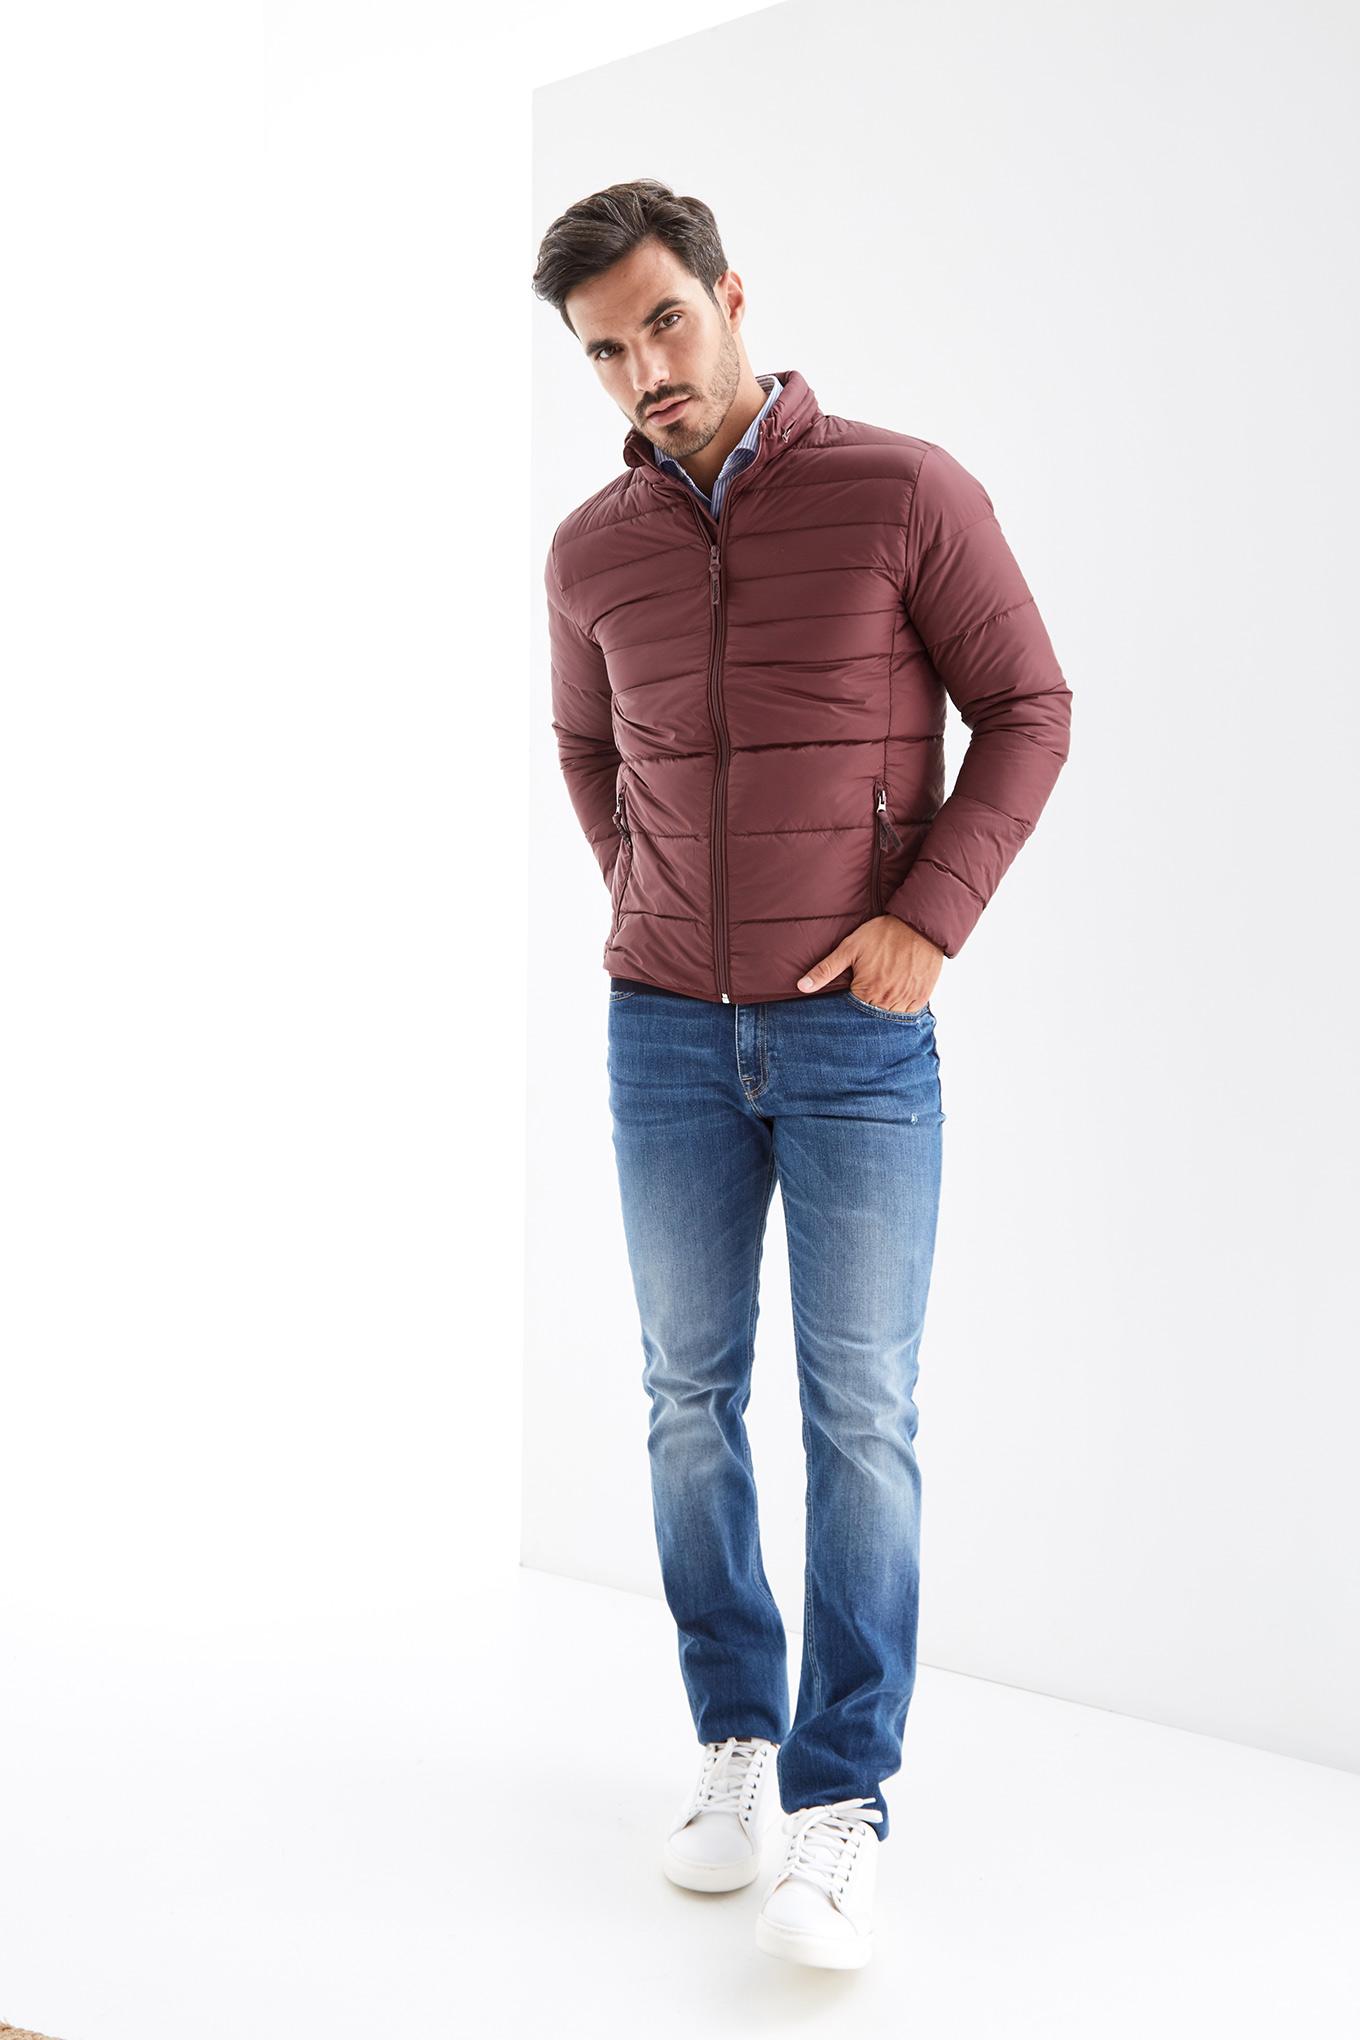 Jacket Bordeaux Casual Man